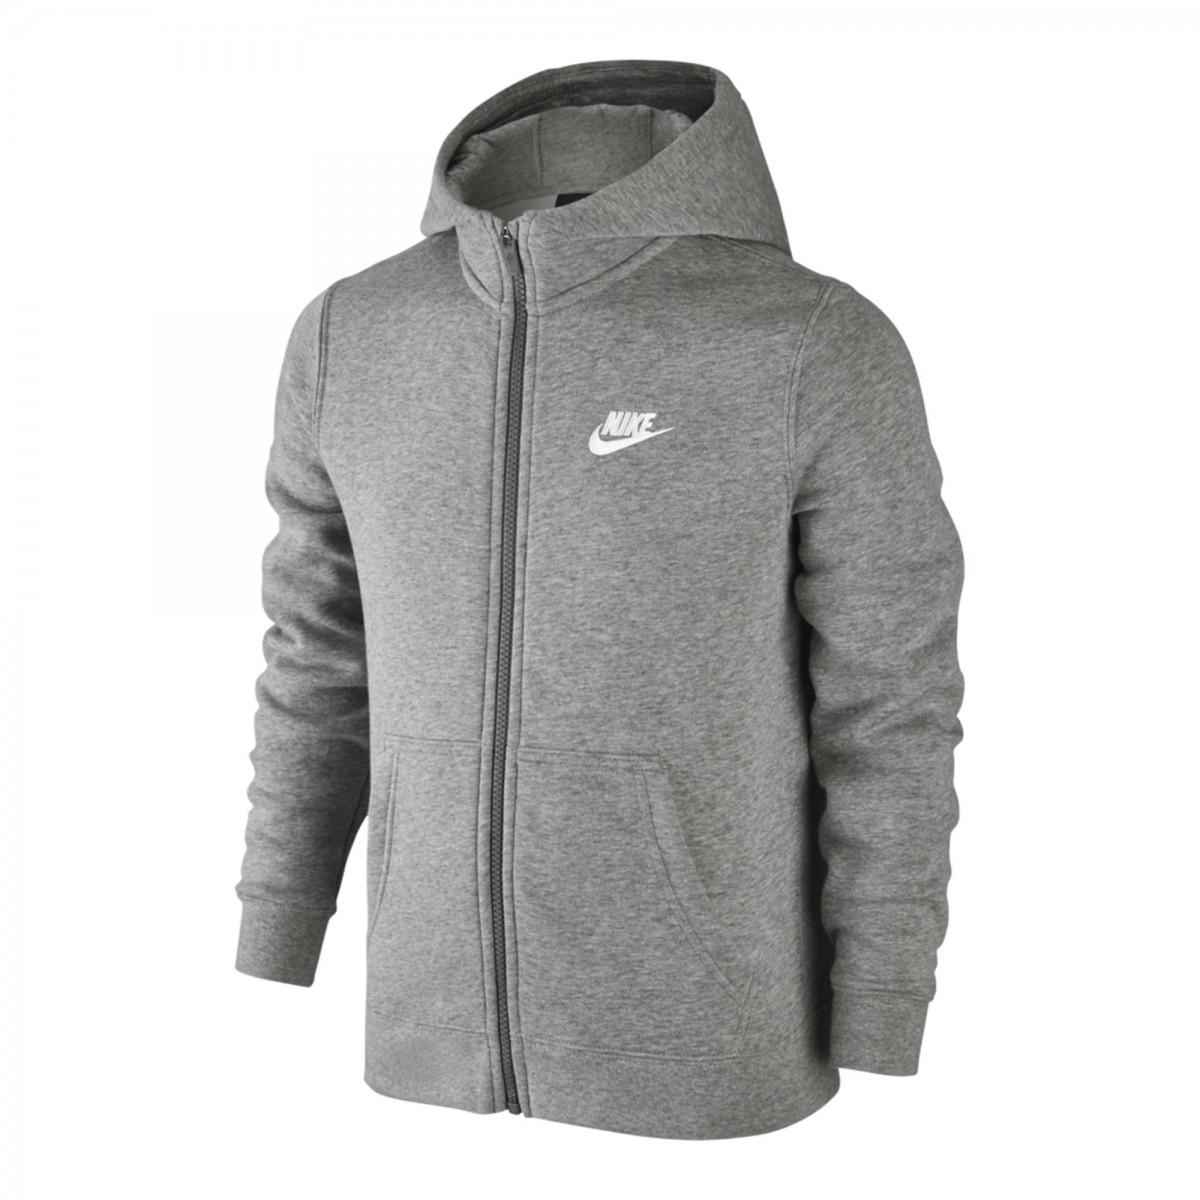 a52b6905a2779 Bizz Store - Jaqueta Infantil Menino Nike NSW Hoodie FZ Moletom